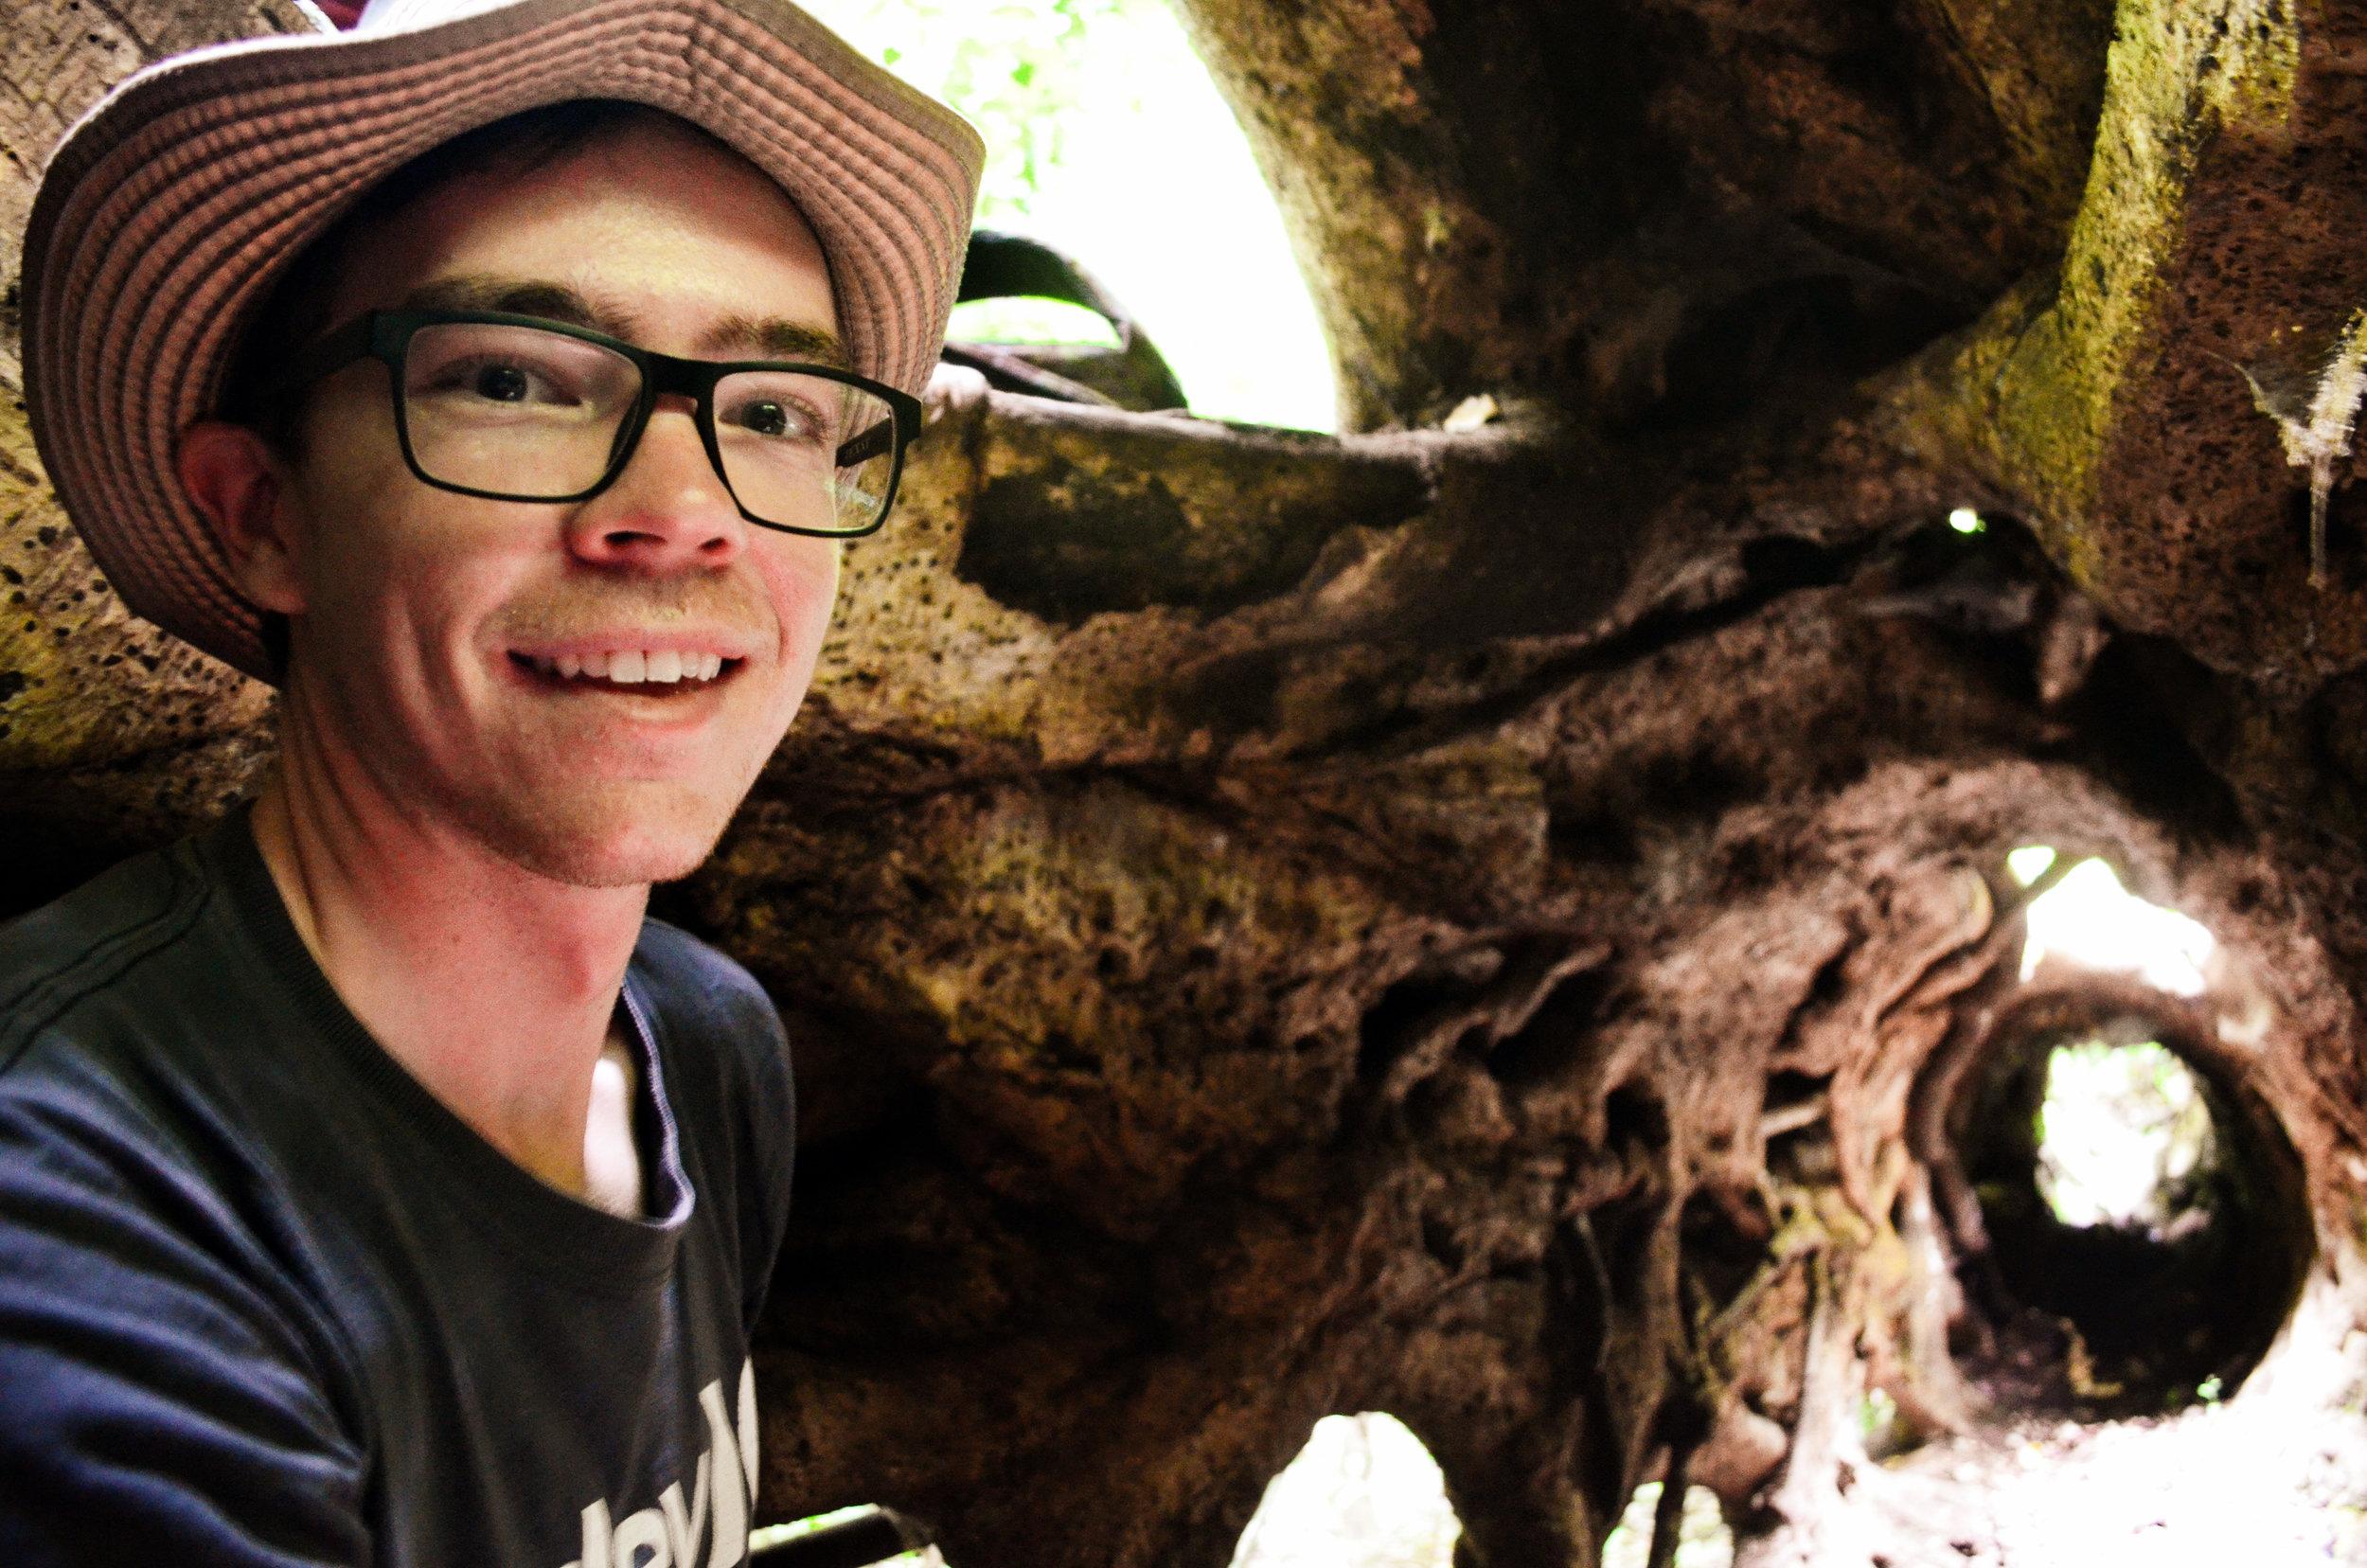 Jared inside a matapalo tree